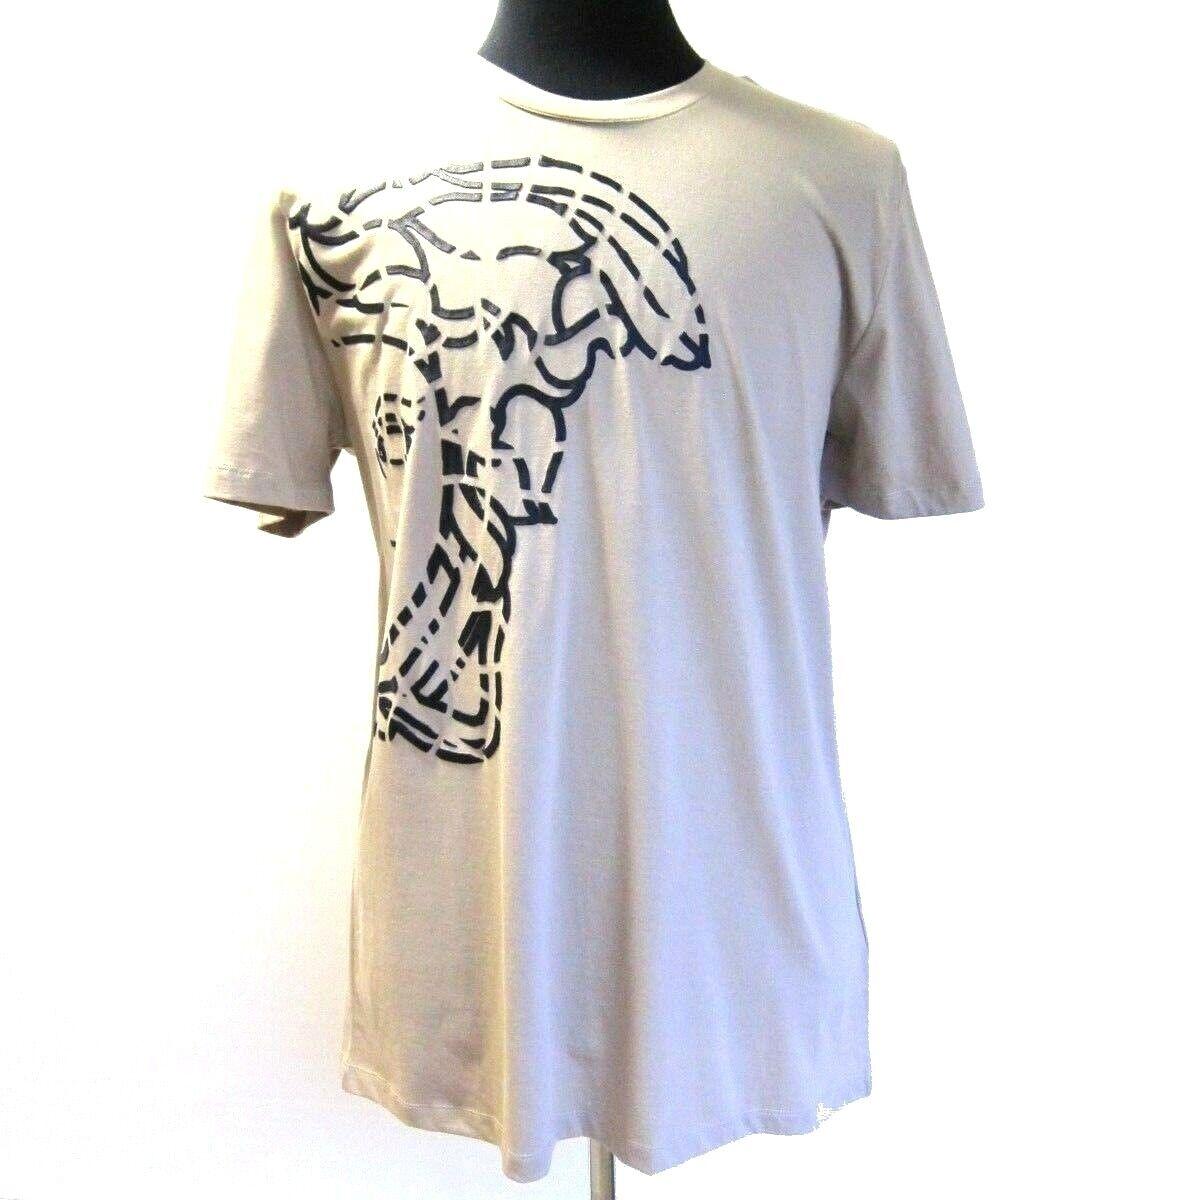 B-463923 Nuovo Versace Collection Marronee Logo Design T-Shirt Manica Corta